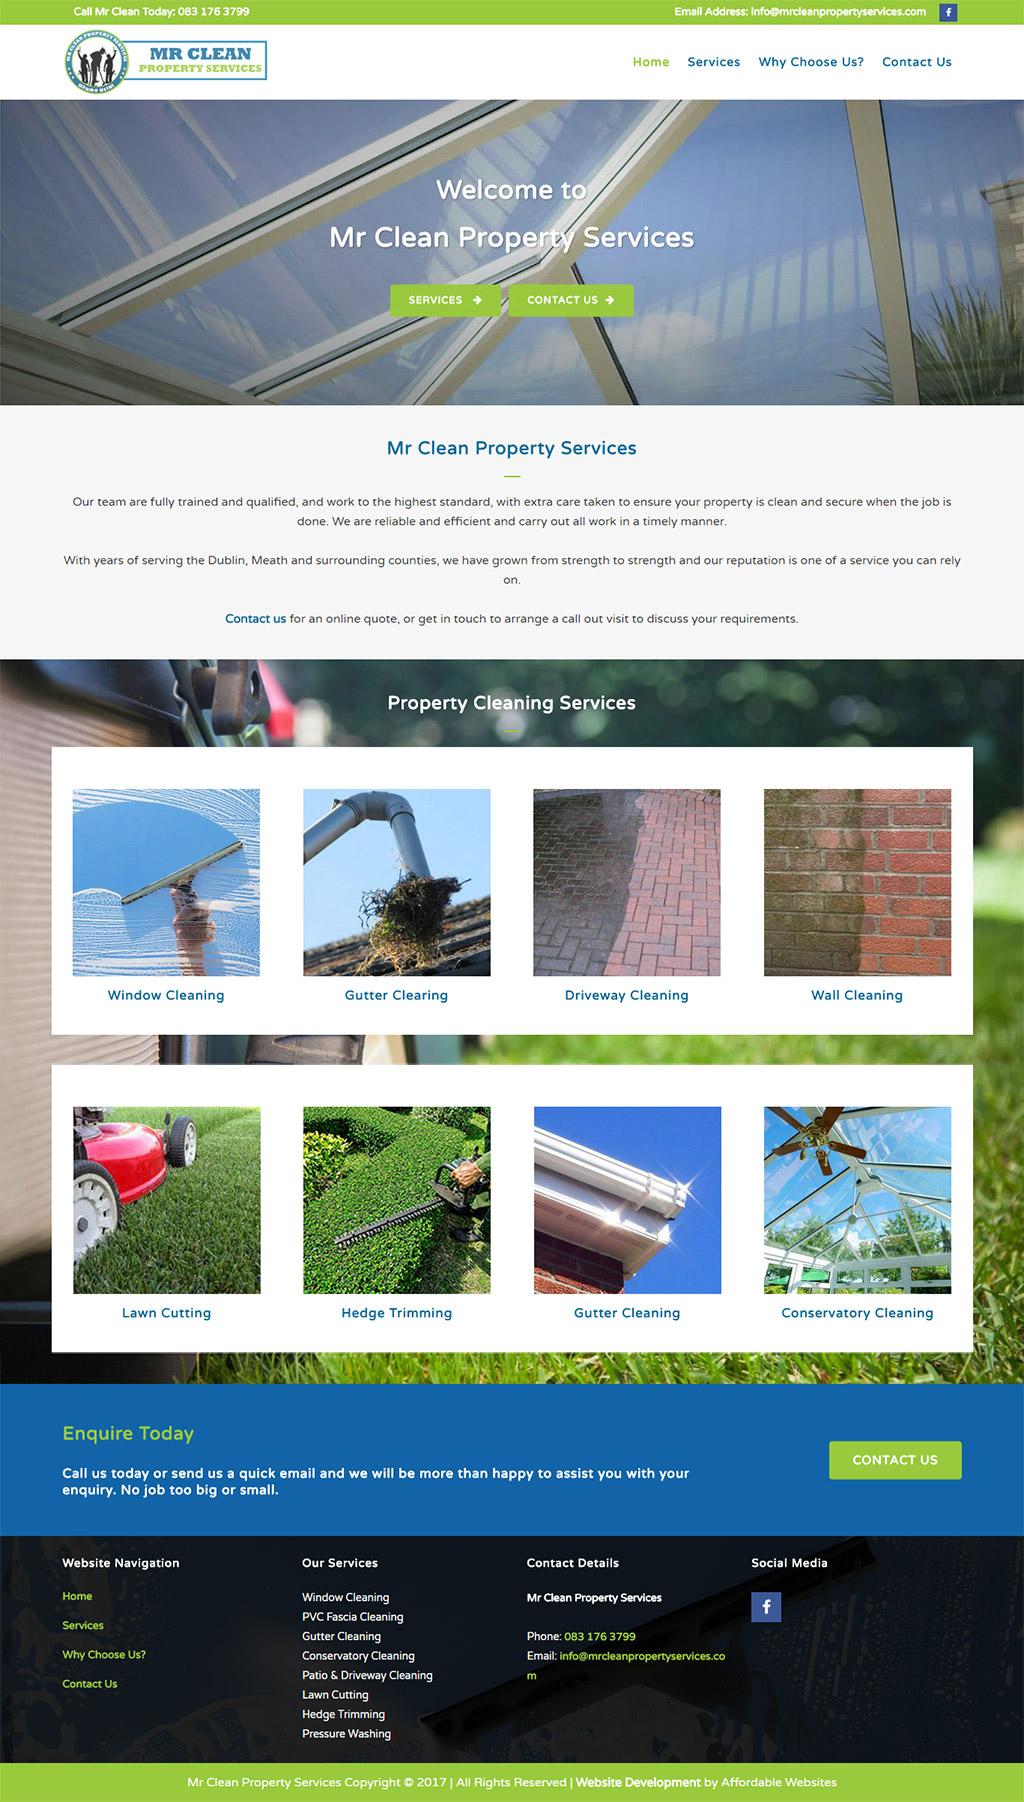 Mr Clean Property Website by www.affordablewebsites.ie